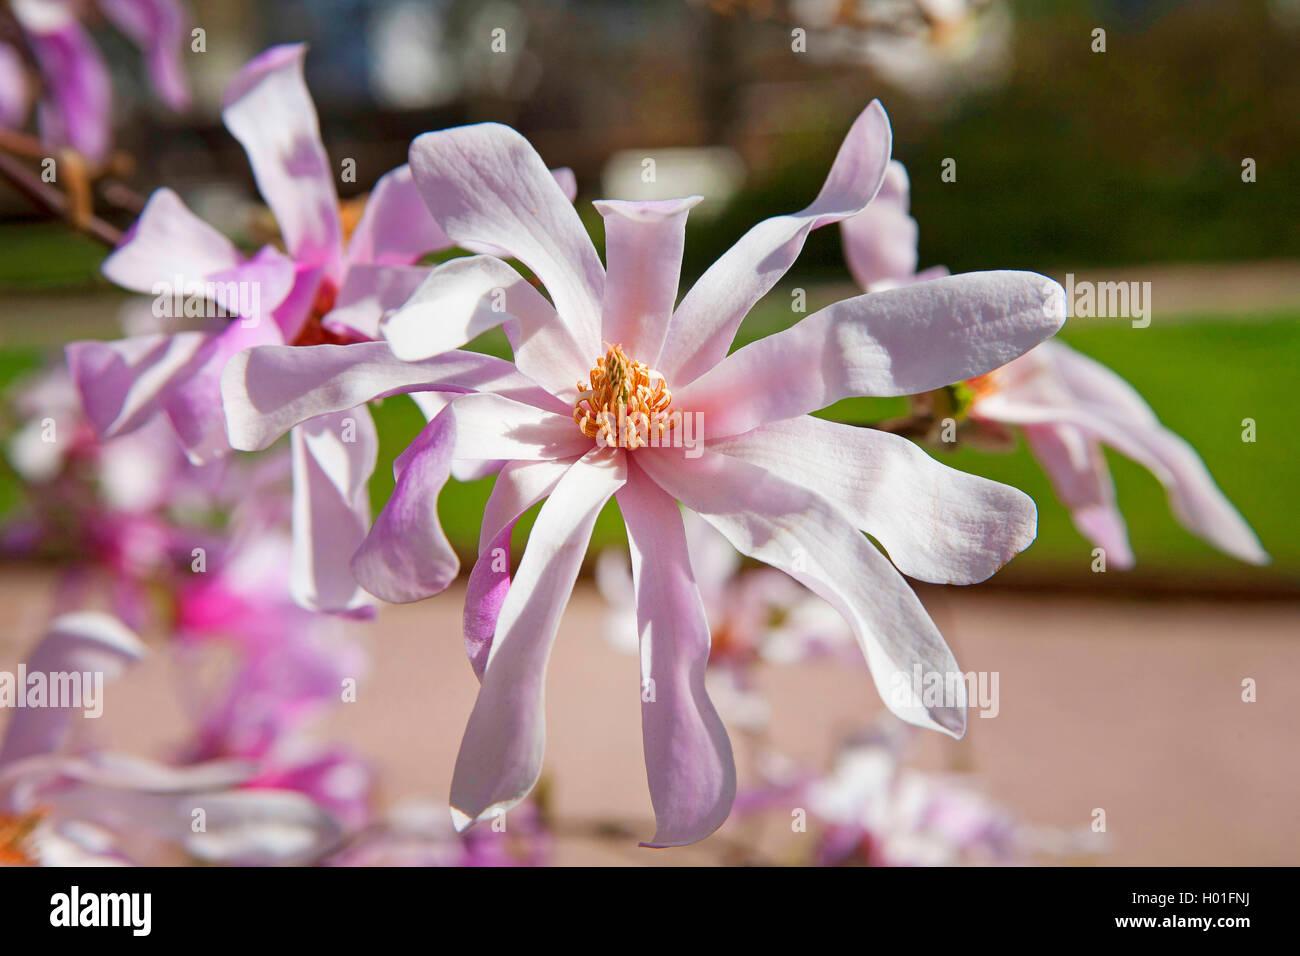 star magnolia (Magnolia stellata 'Leonard Messel', Magnolia stellata Leonard Messel), cultivar Leonard Messel Stock Photo